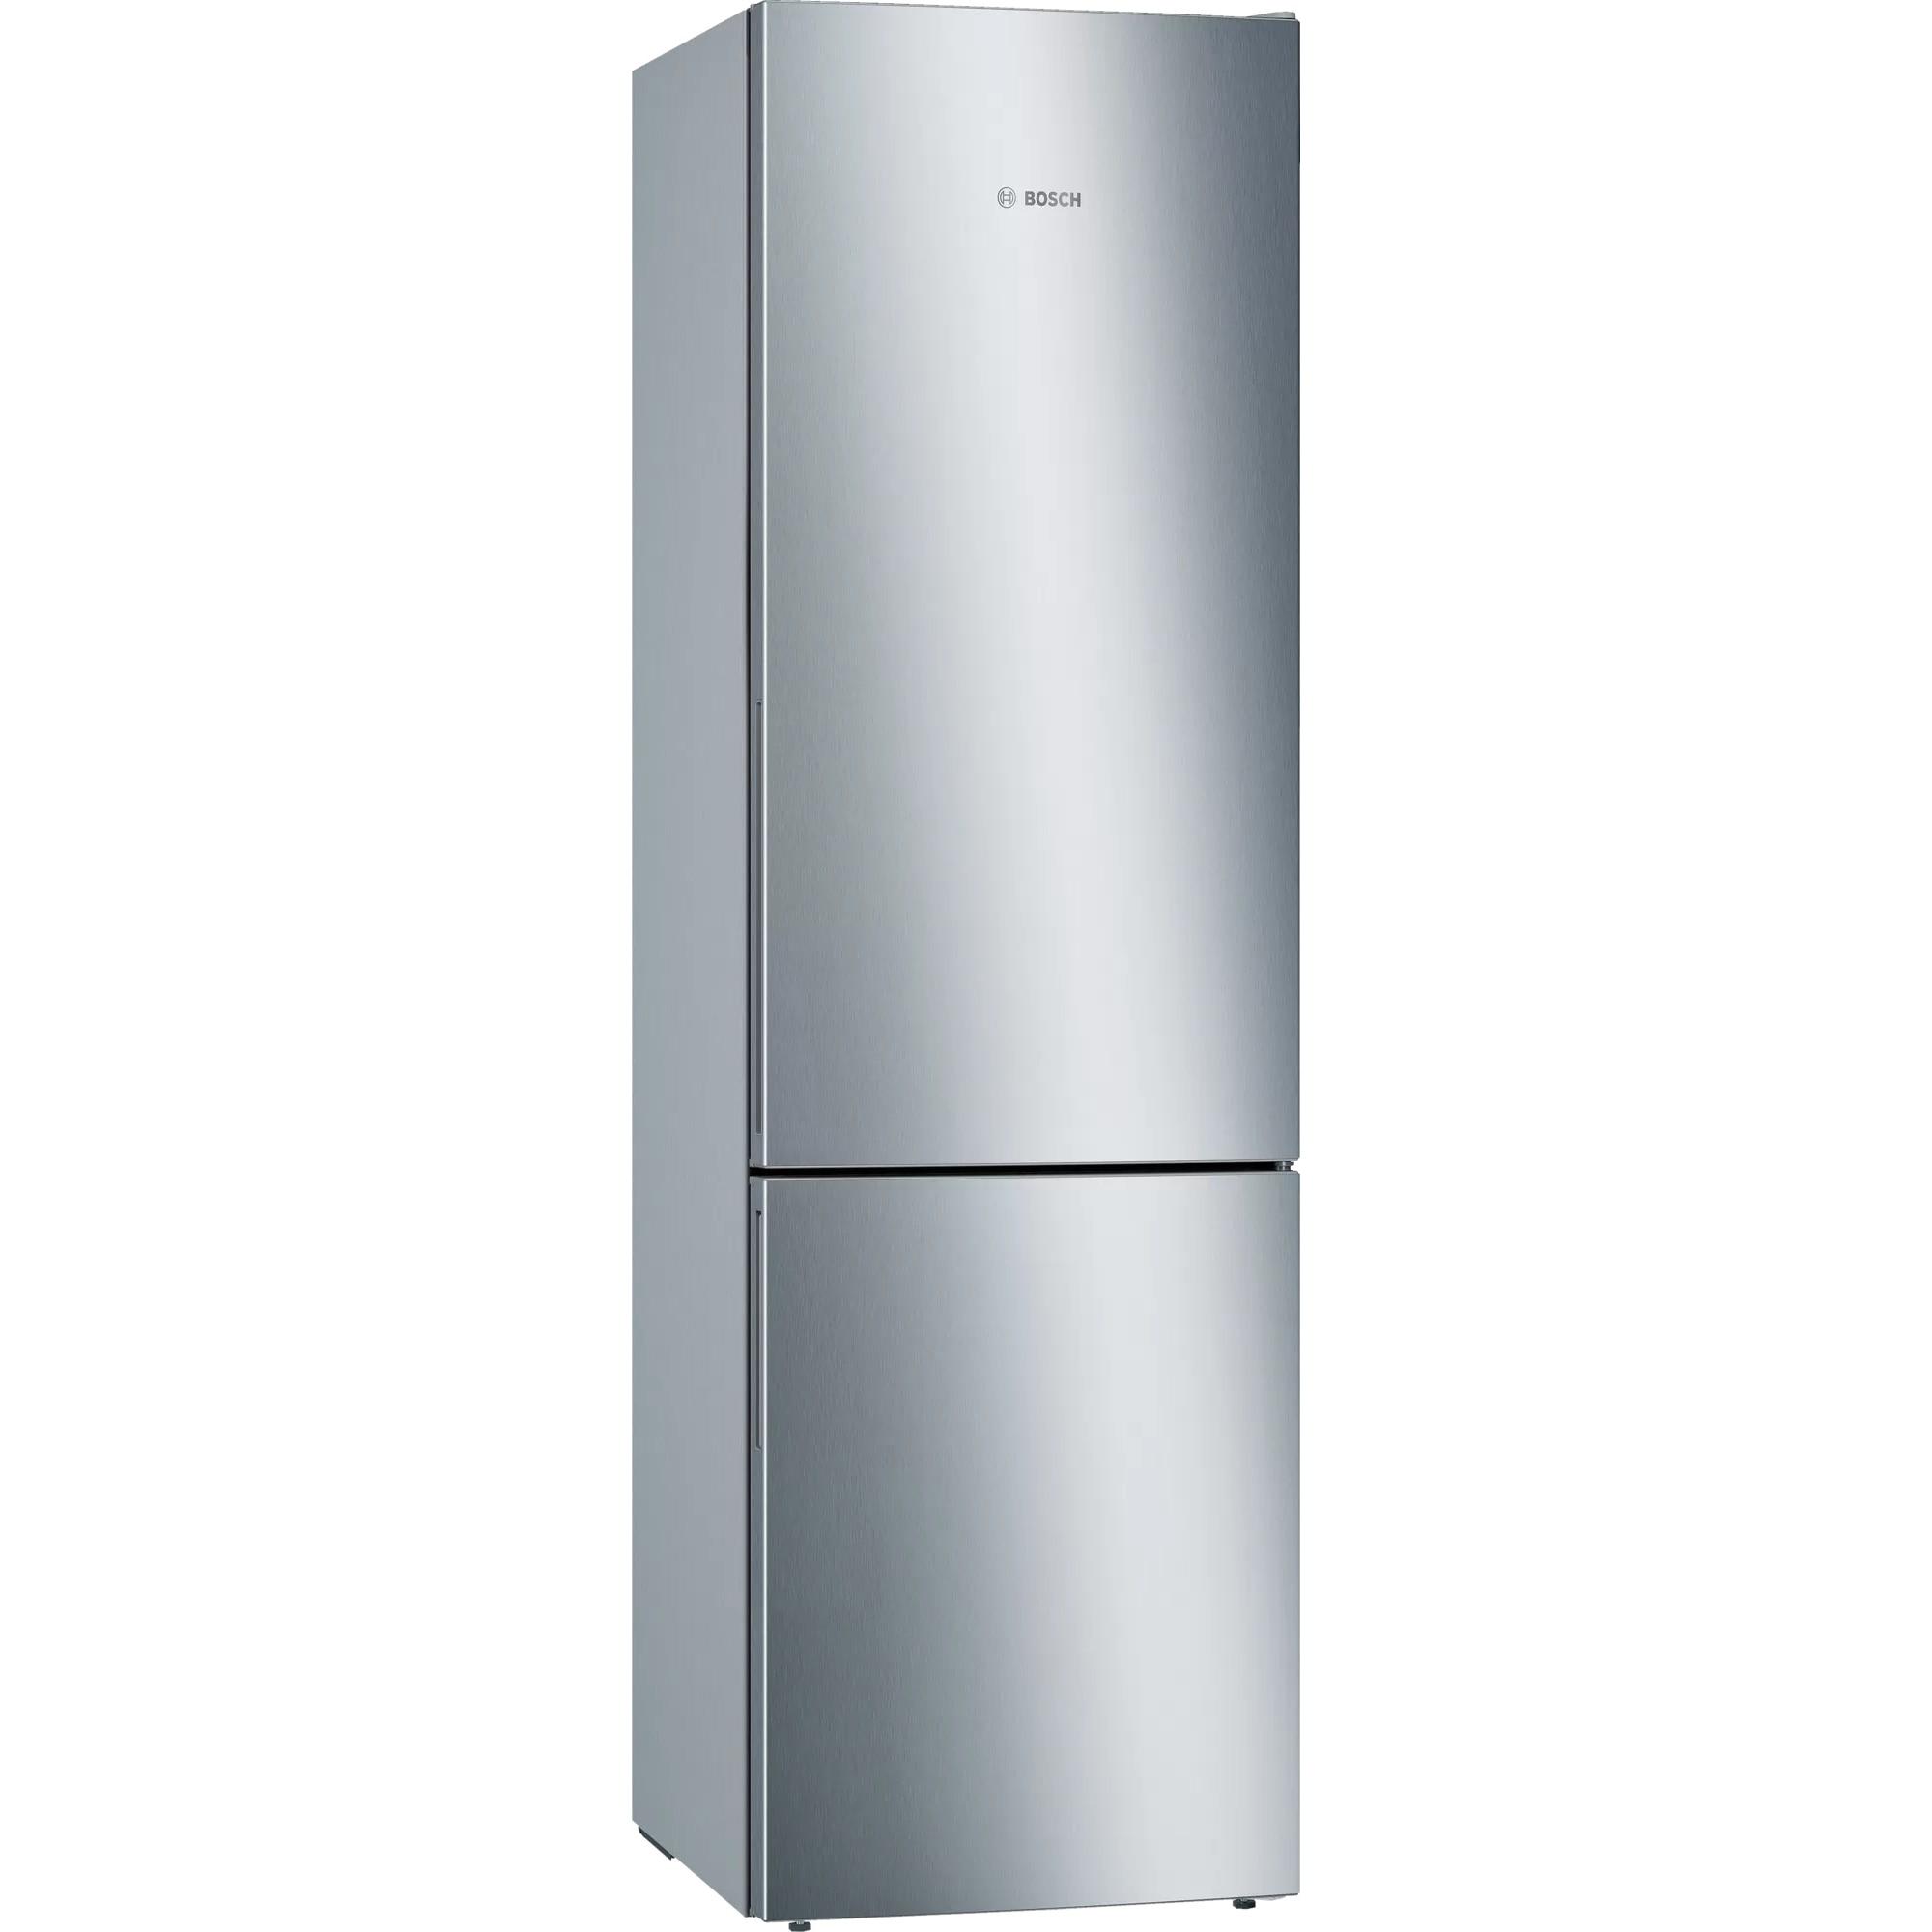 Fotografie Combina frigorifica Bosch KGE39ALCA, 343 l, Clasa C, Low Frost, VitaFresh, H 201 cm, Argintiu